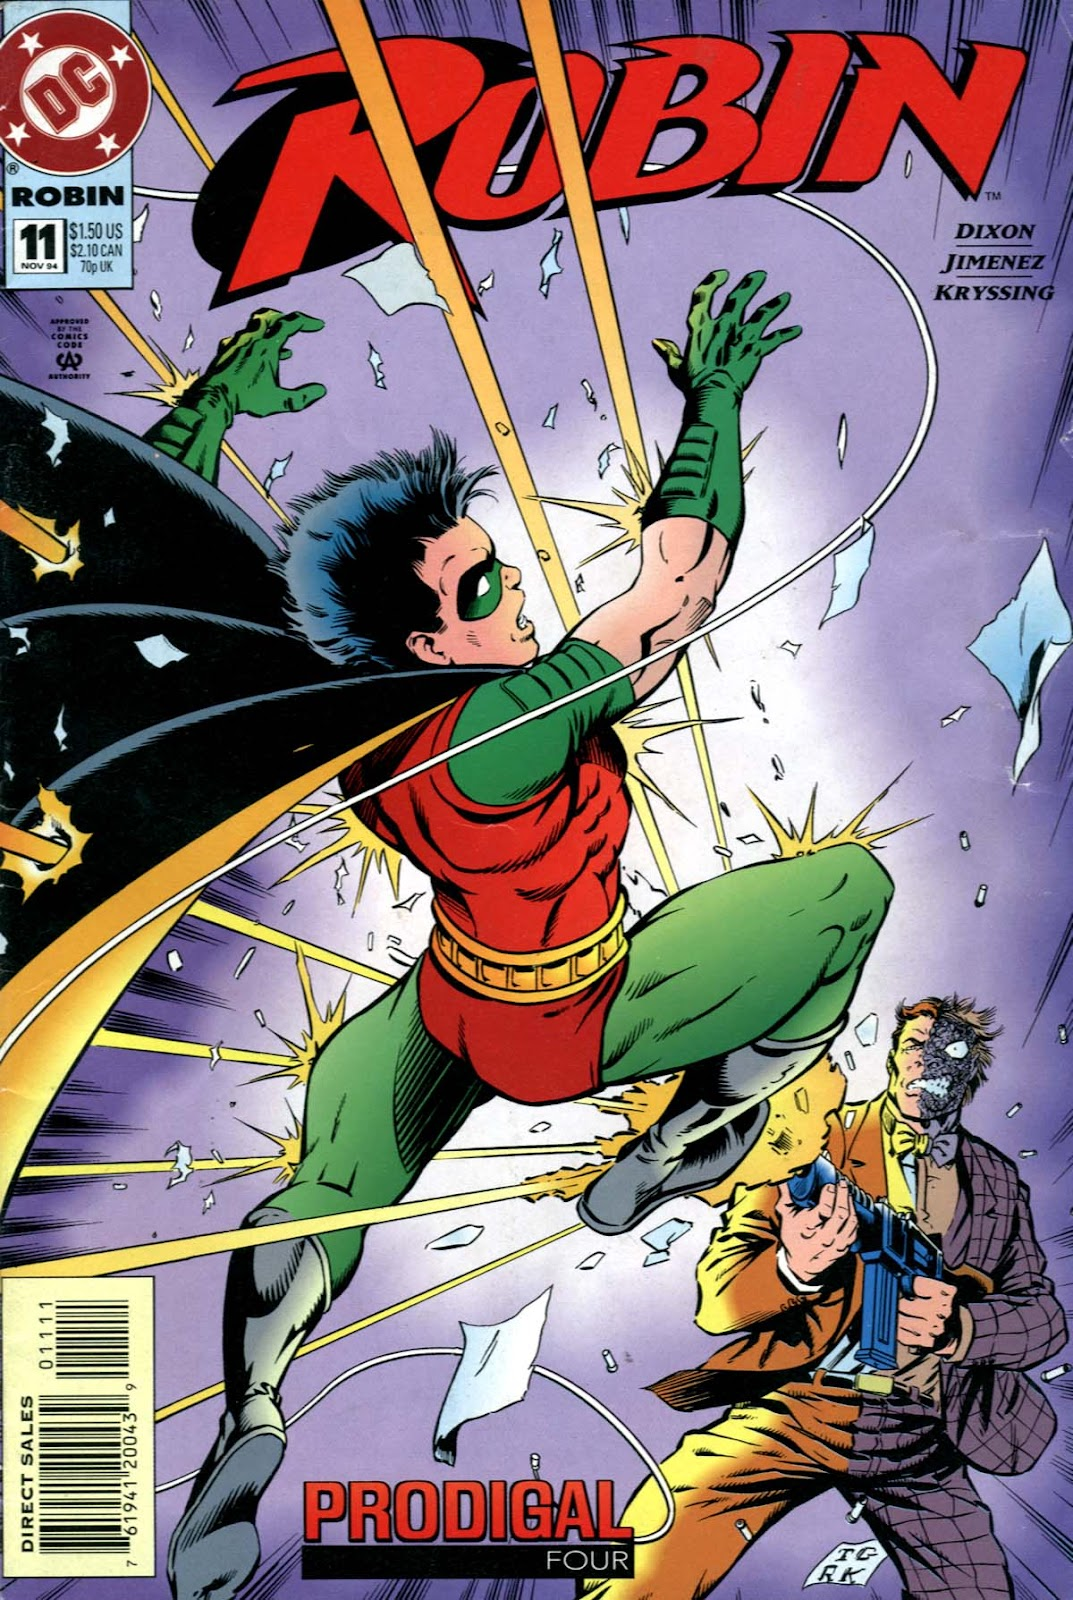 batman knightfall prodigal issue 4 read full comics online for